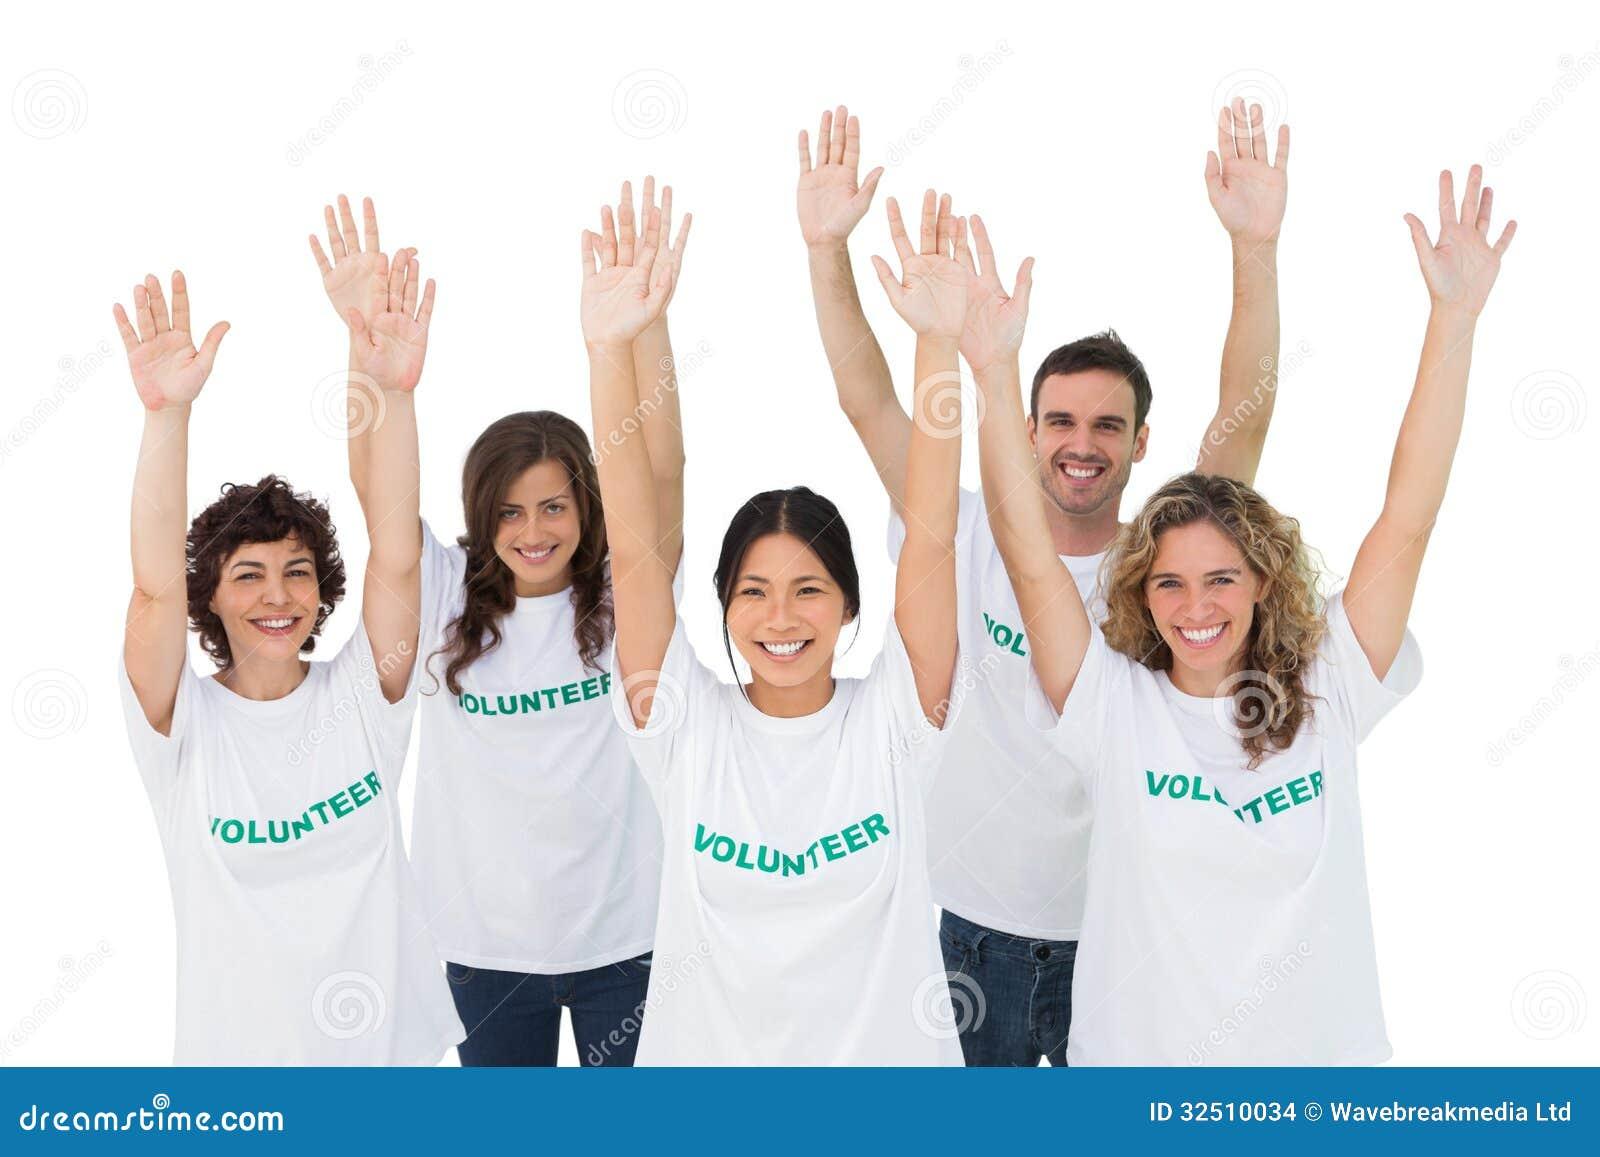 Groep vrijwilligers die wapens opheffen